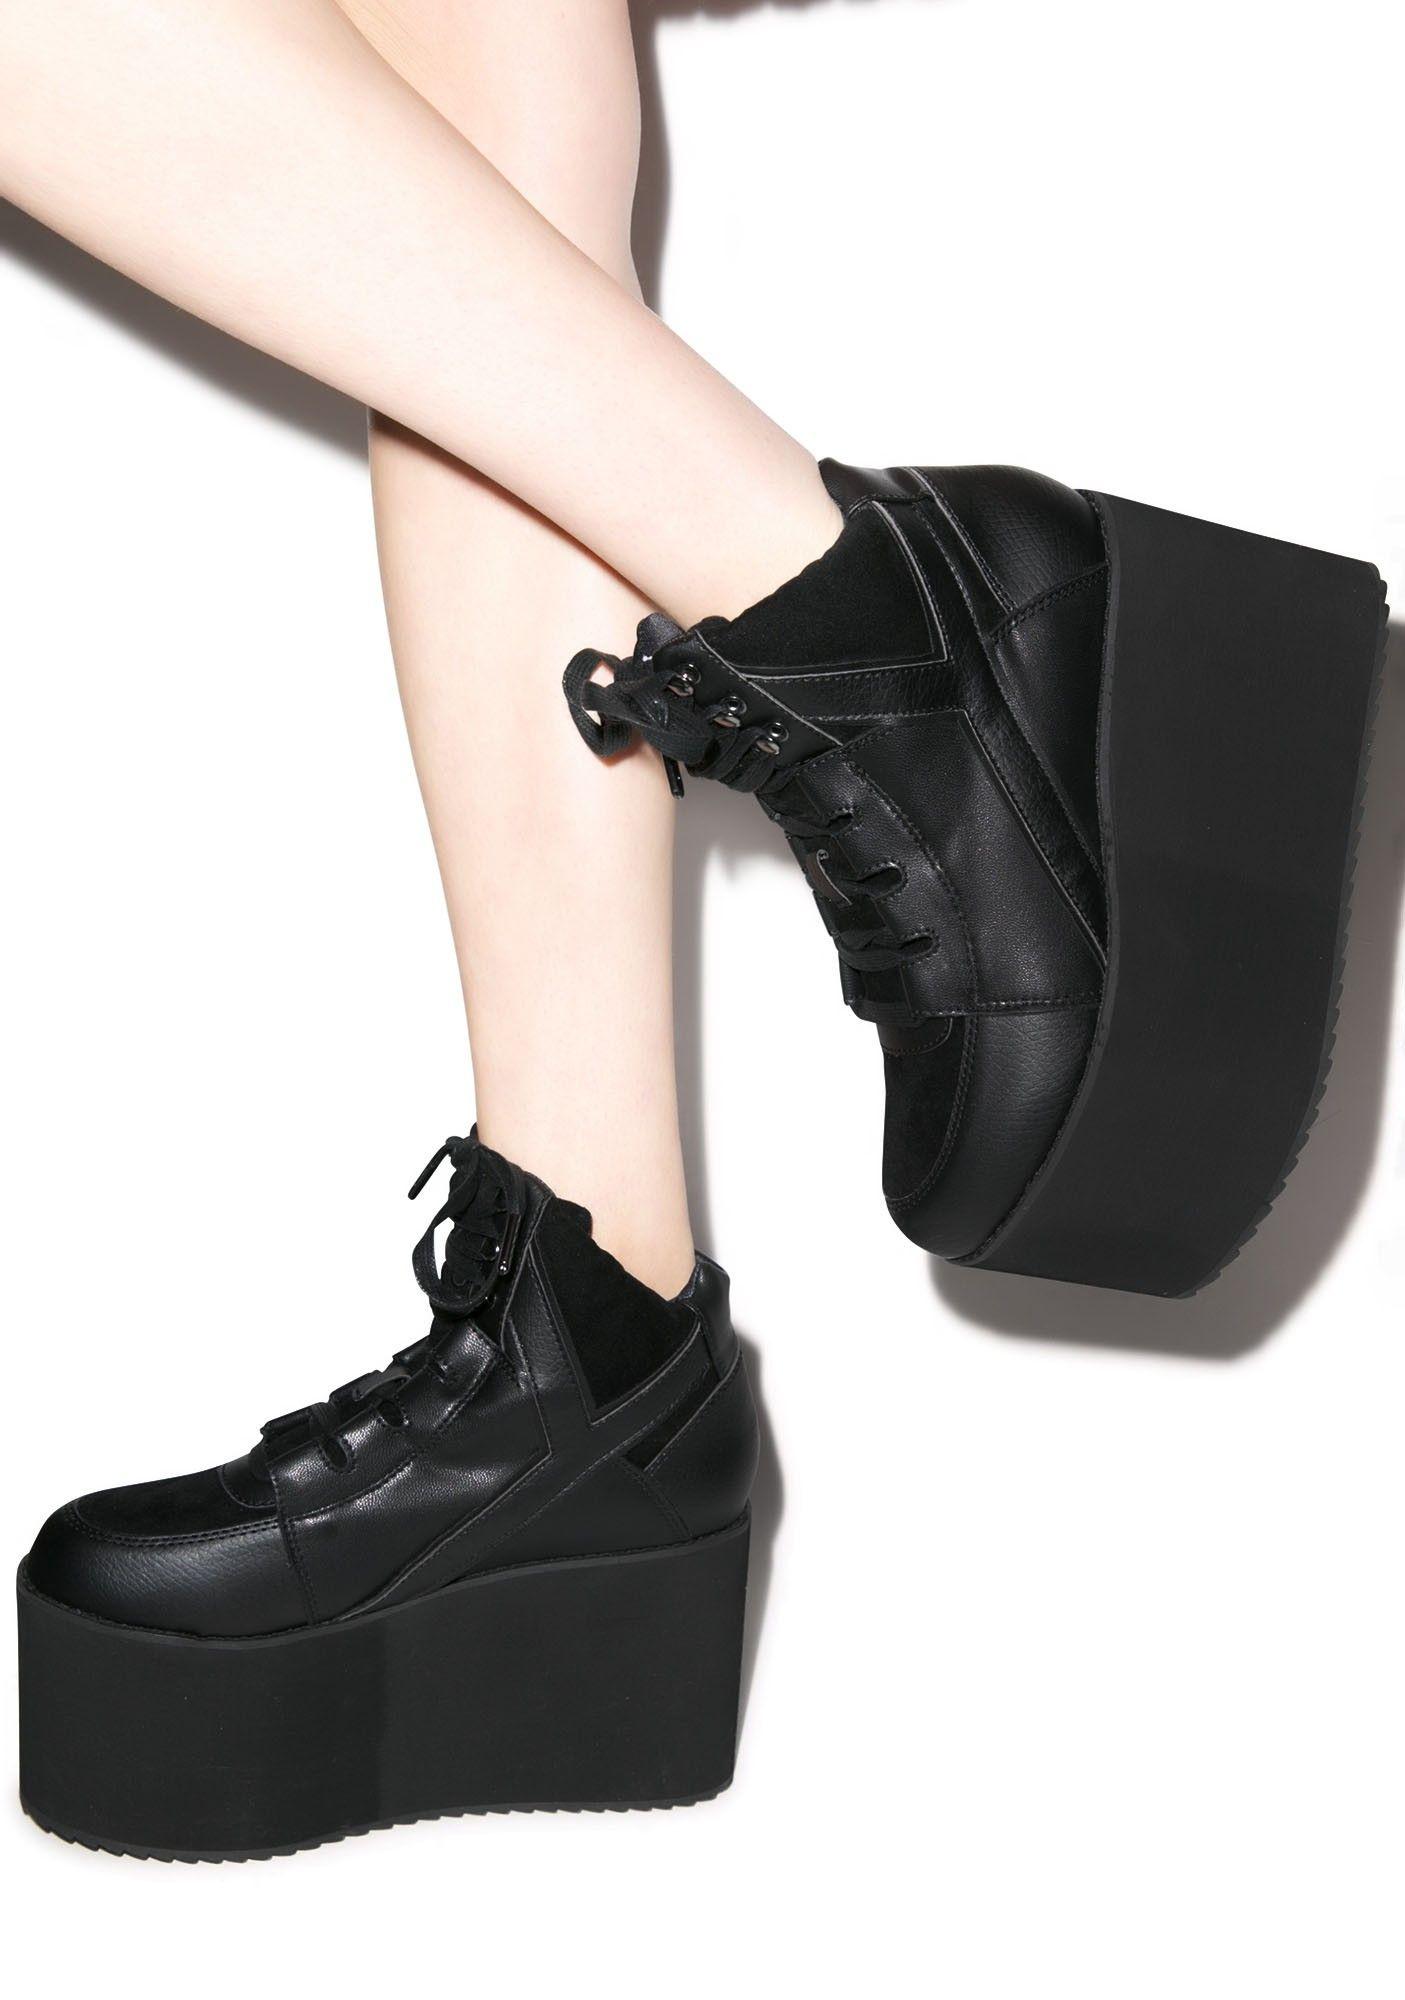 dcdfe750e827 Y.R.U. Qozmo Hi Platform Sneakers   Dolls Kill